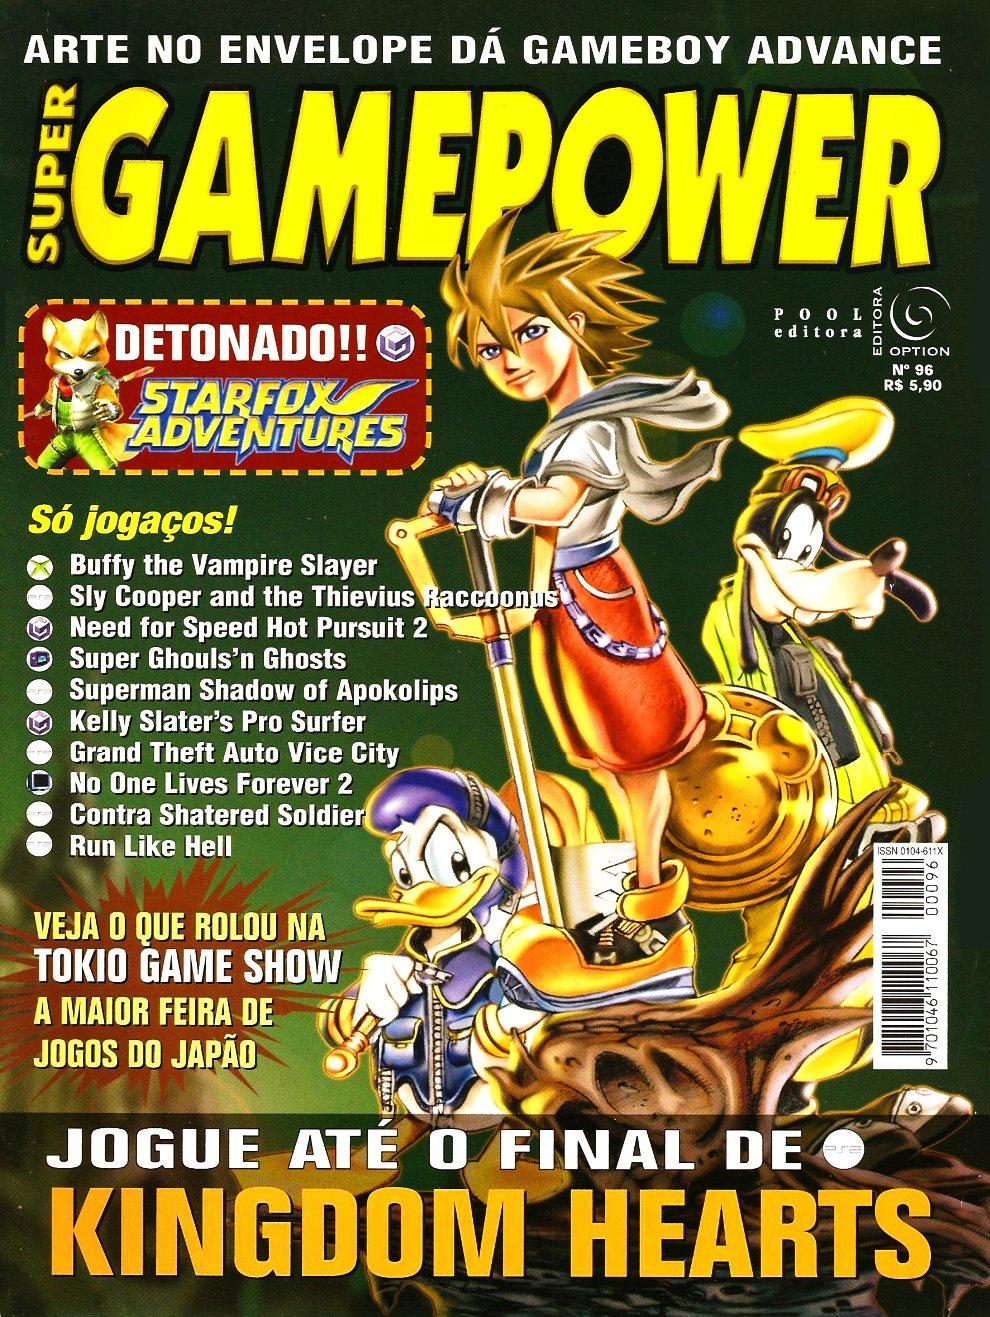 SuperGamePower Issue 096 (October 2002)